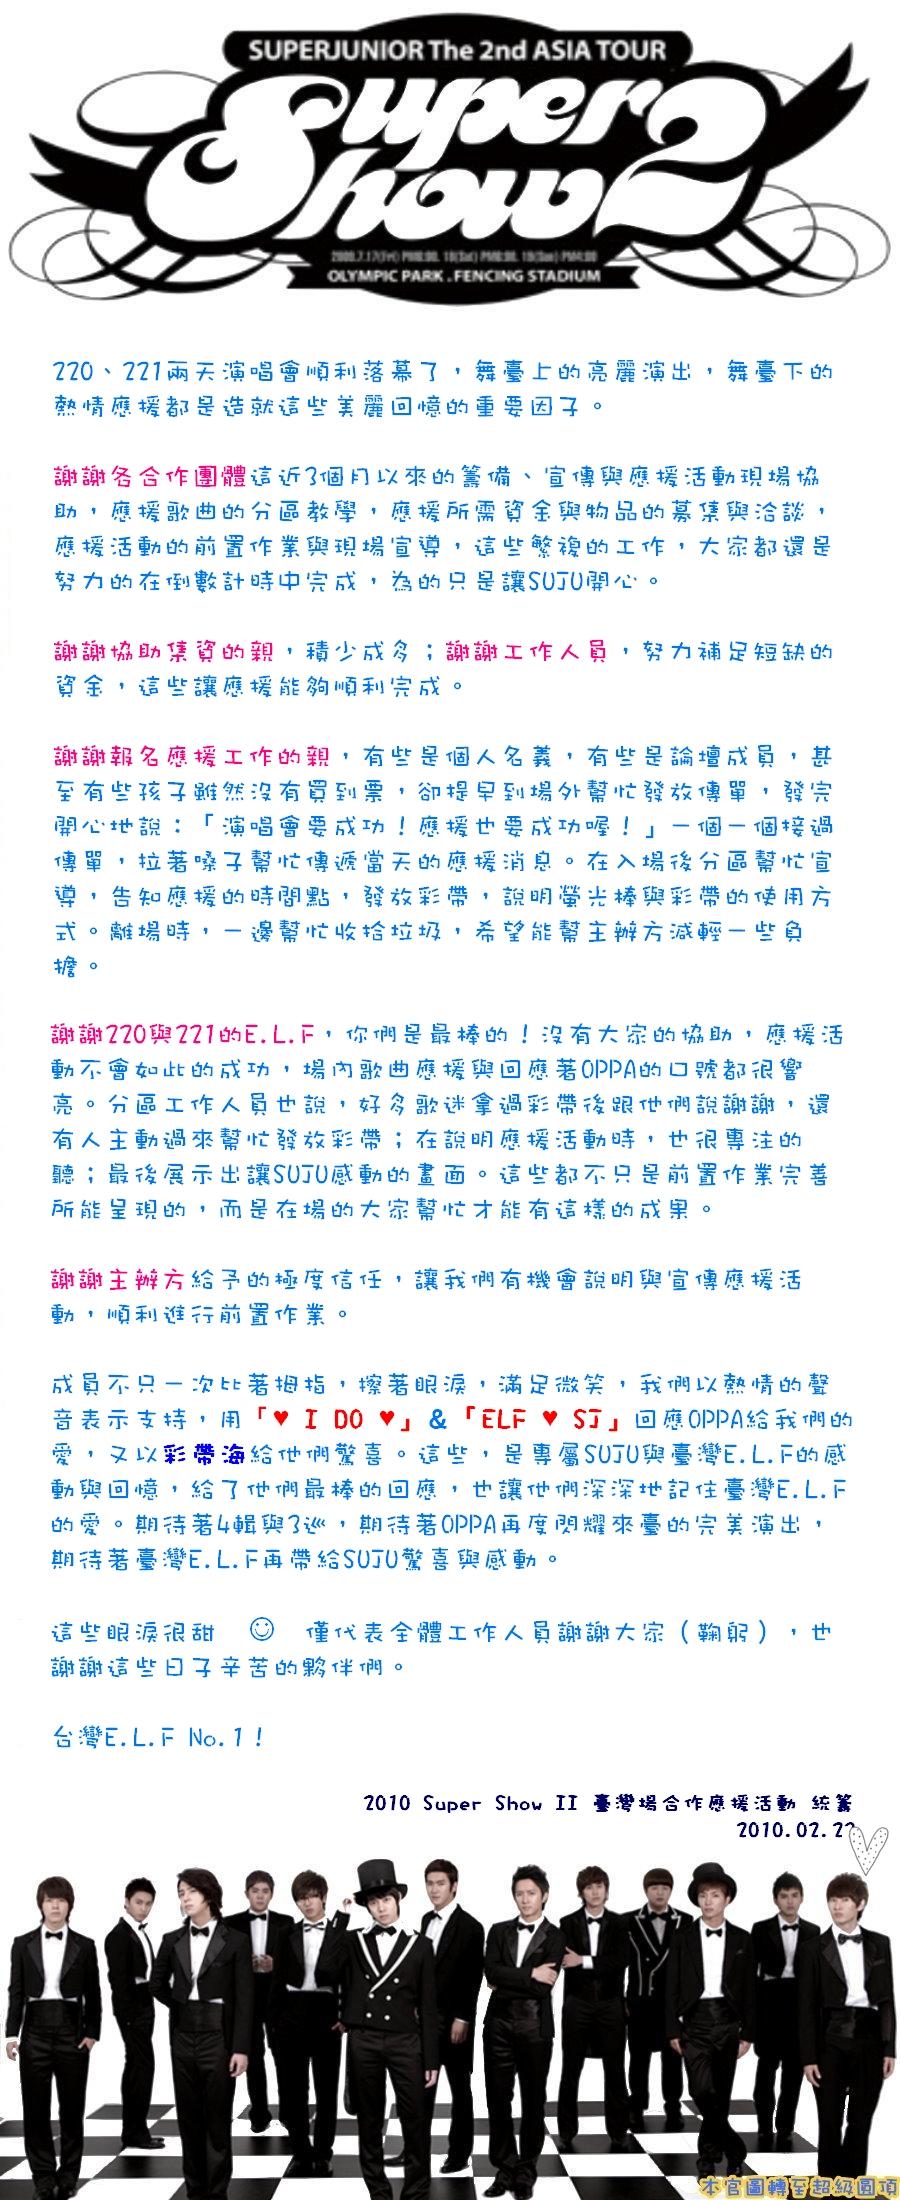 2010 Super Show II 台灣站 應援合作活動感謝.JPG